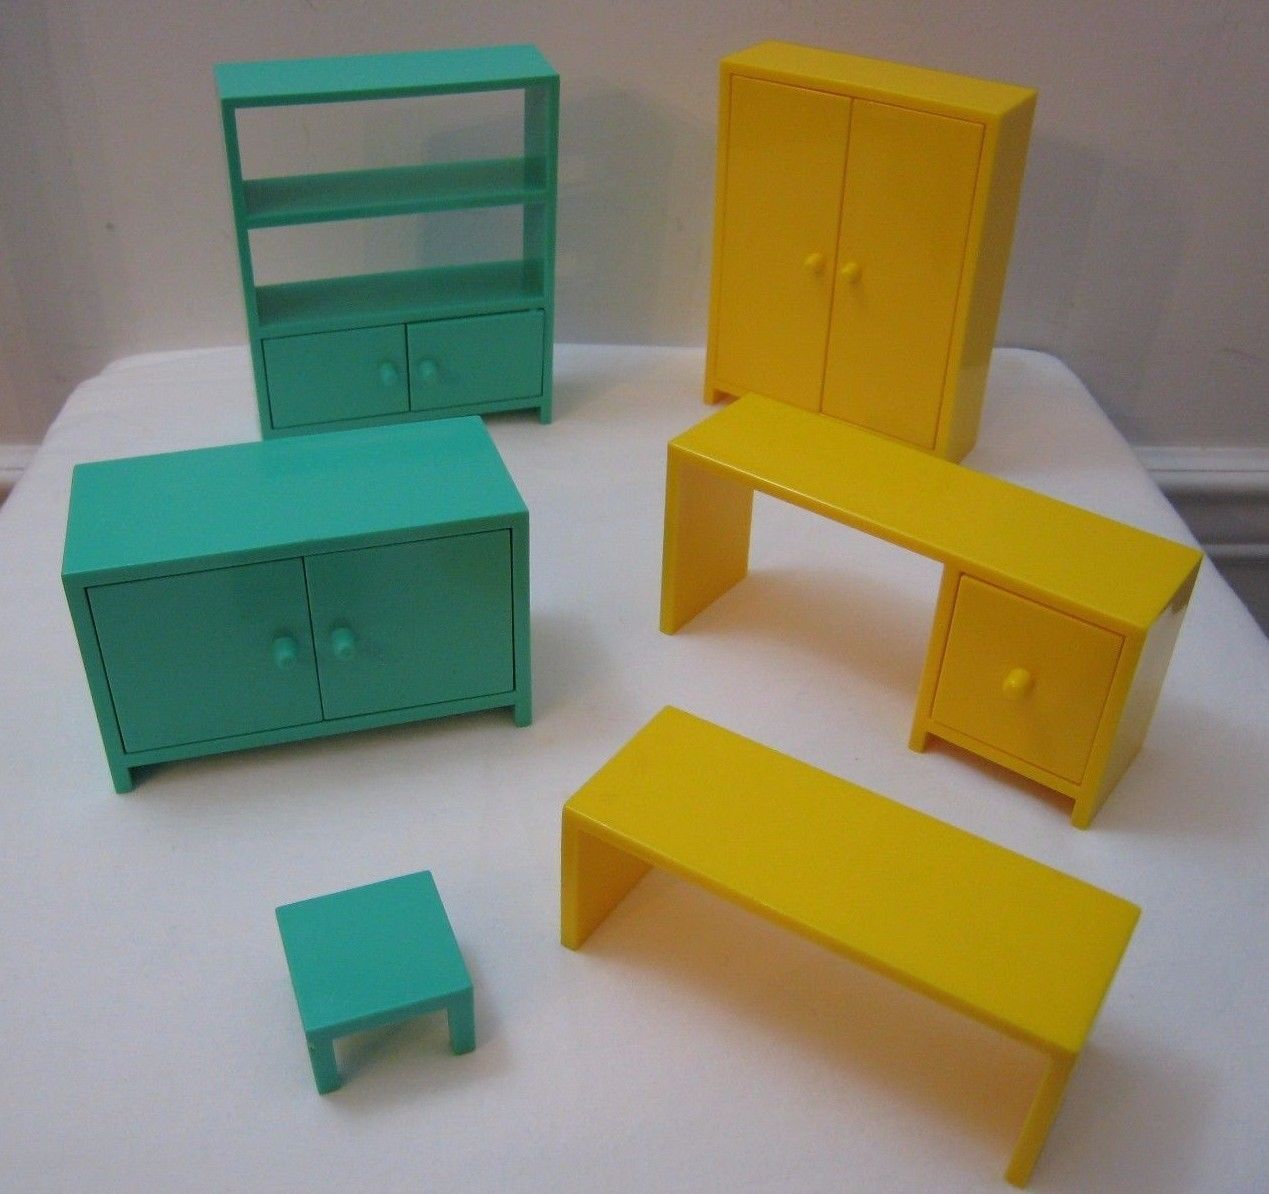 dolls house furniture ikea. Lot Of 6 Ikea Dollhouse Furniture Bookcase Wardrobe Desk Buffet Table Plastic Dolls House R